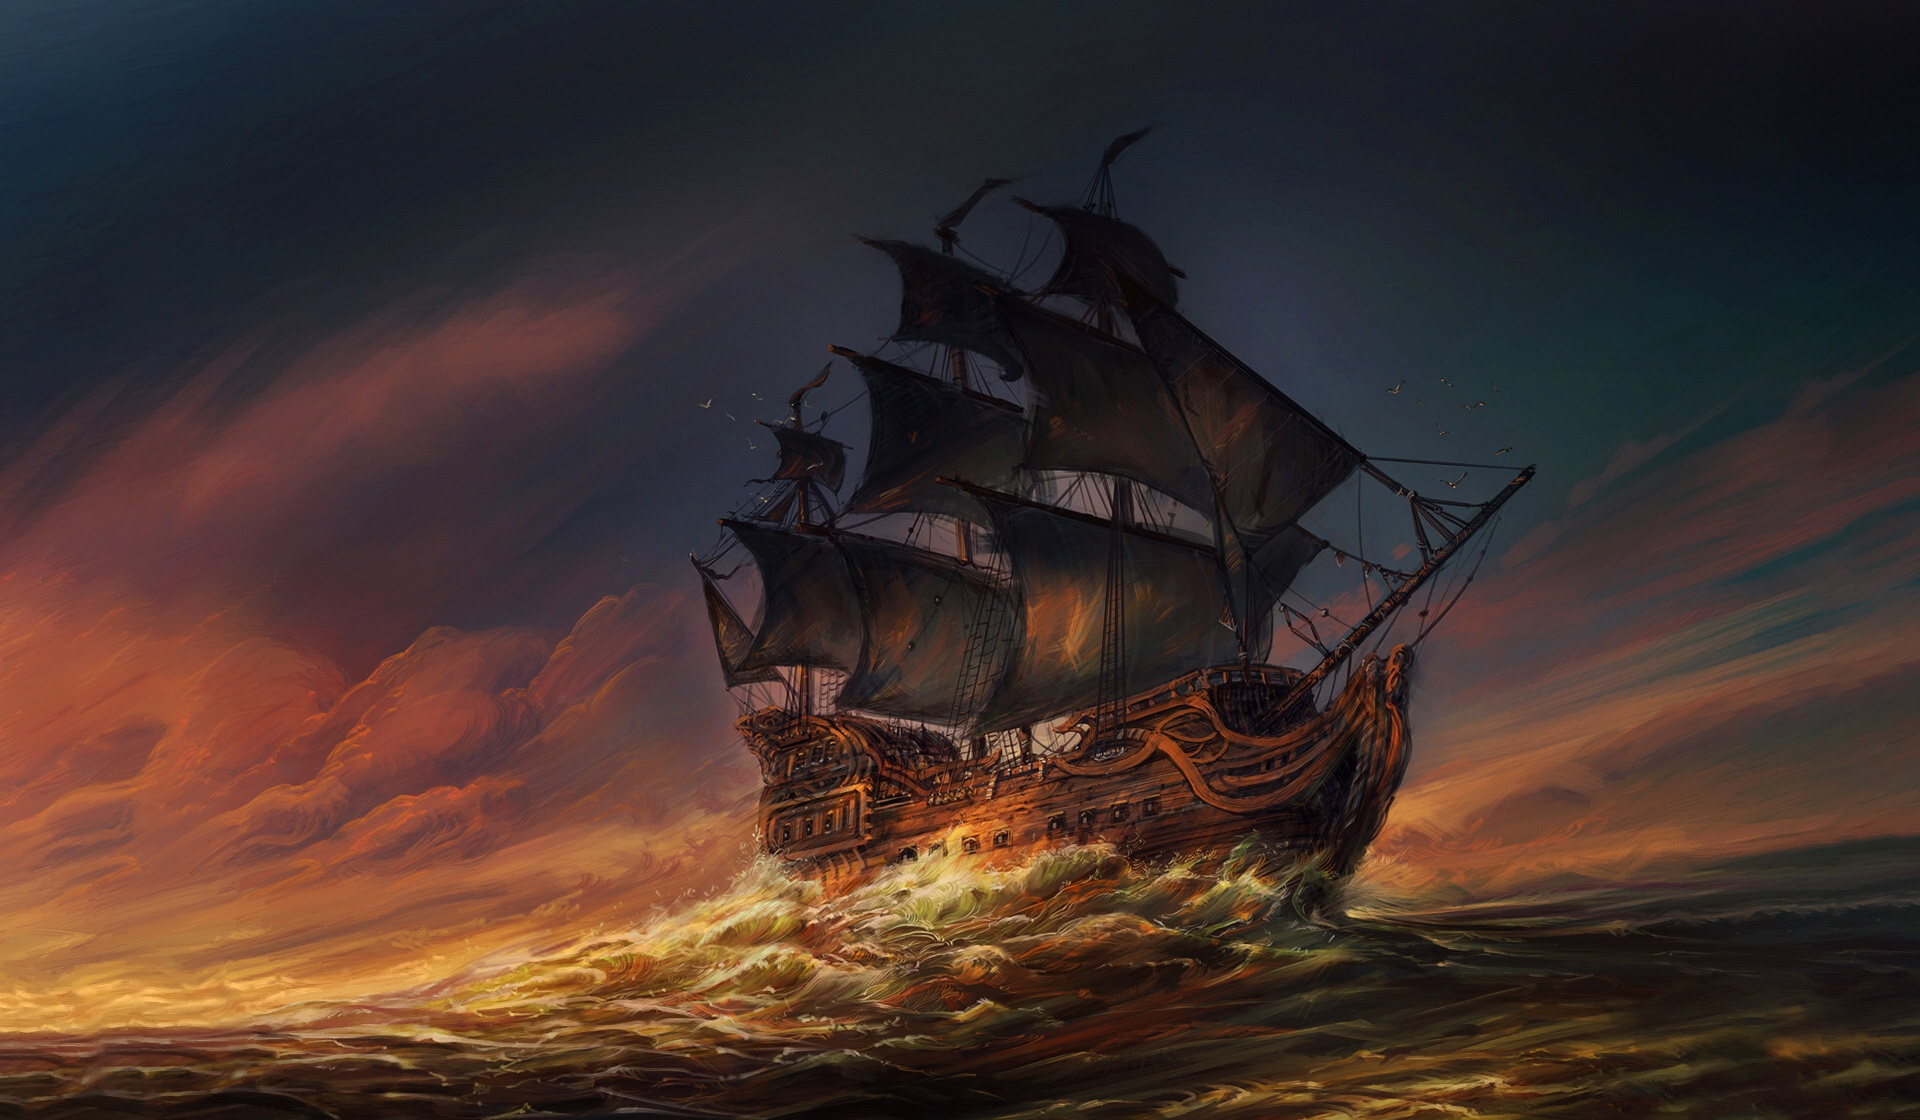 можете подобрать пиратские корабли фото картинки фэнтези минитрактор